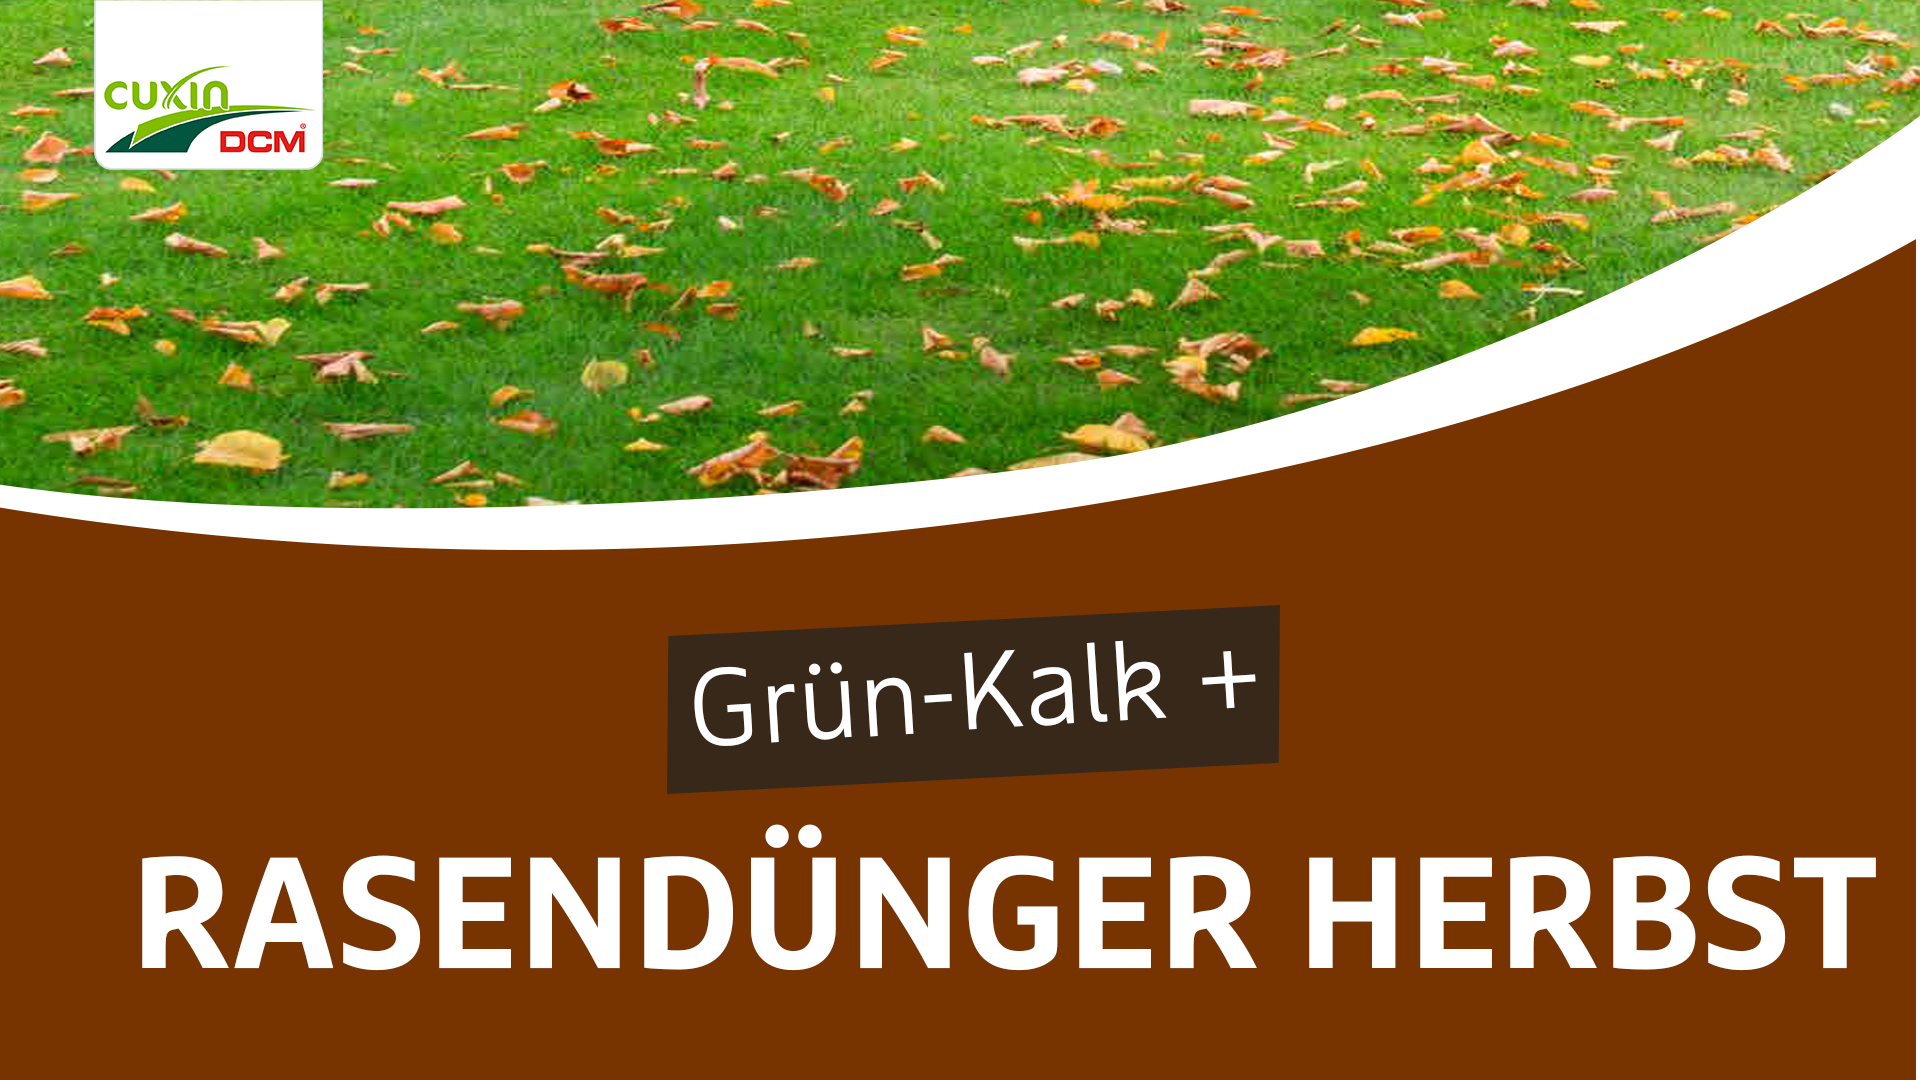 Rasendünger Herbst / Grün-kalk